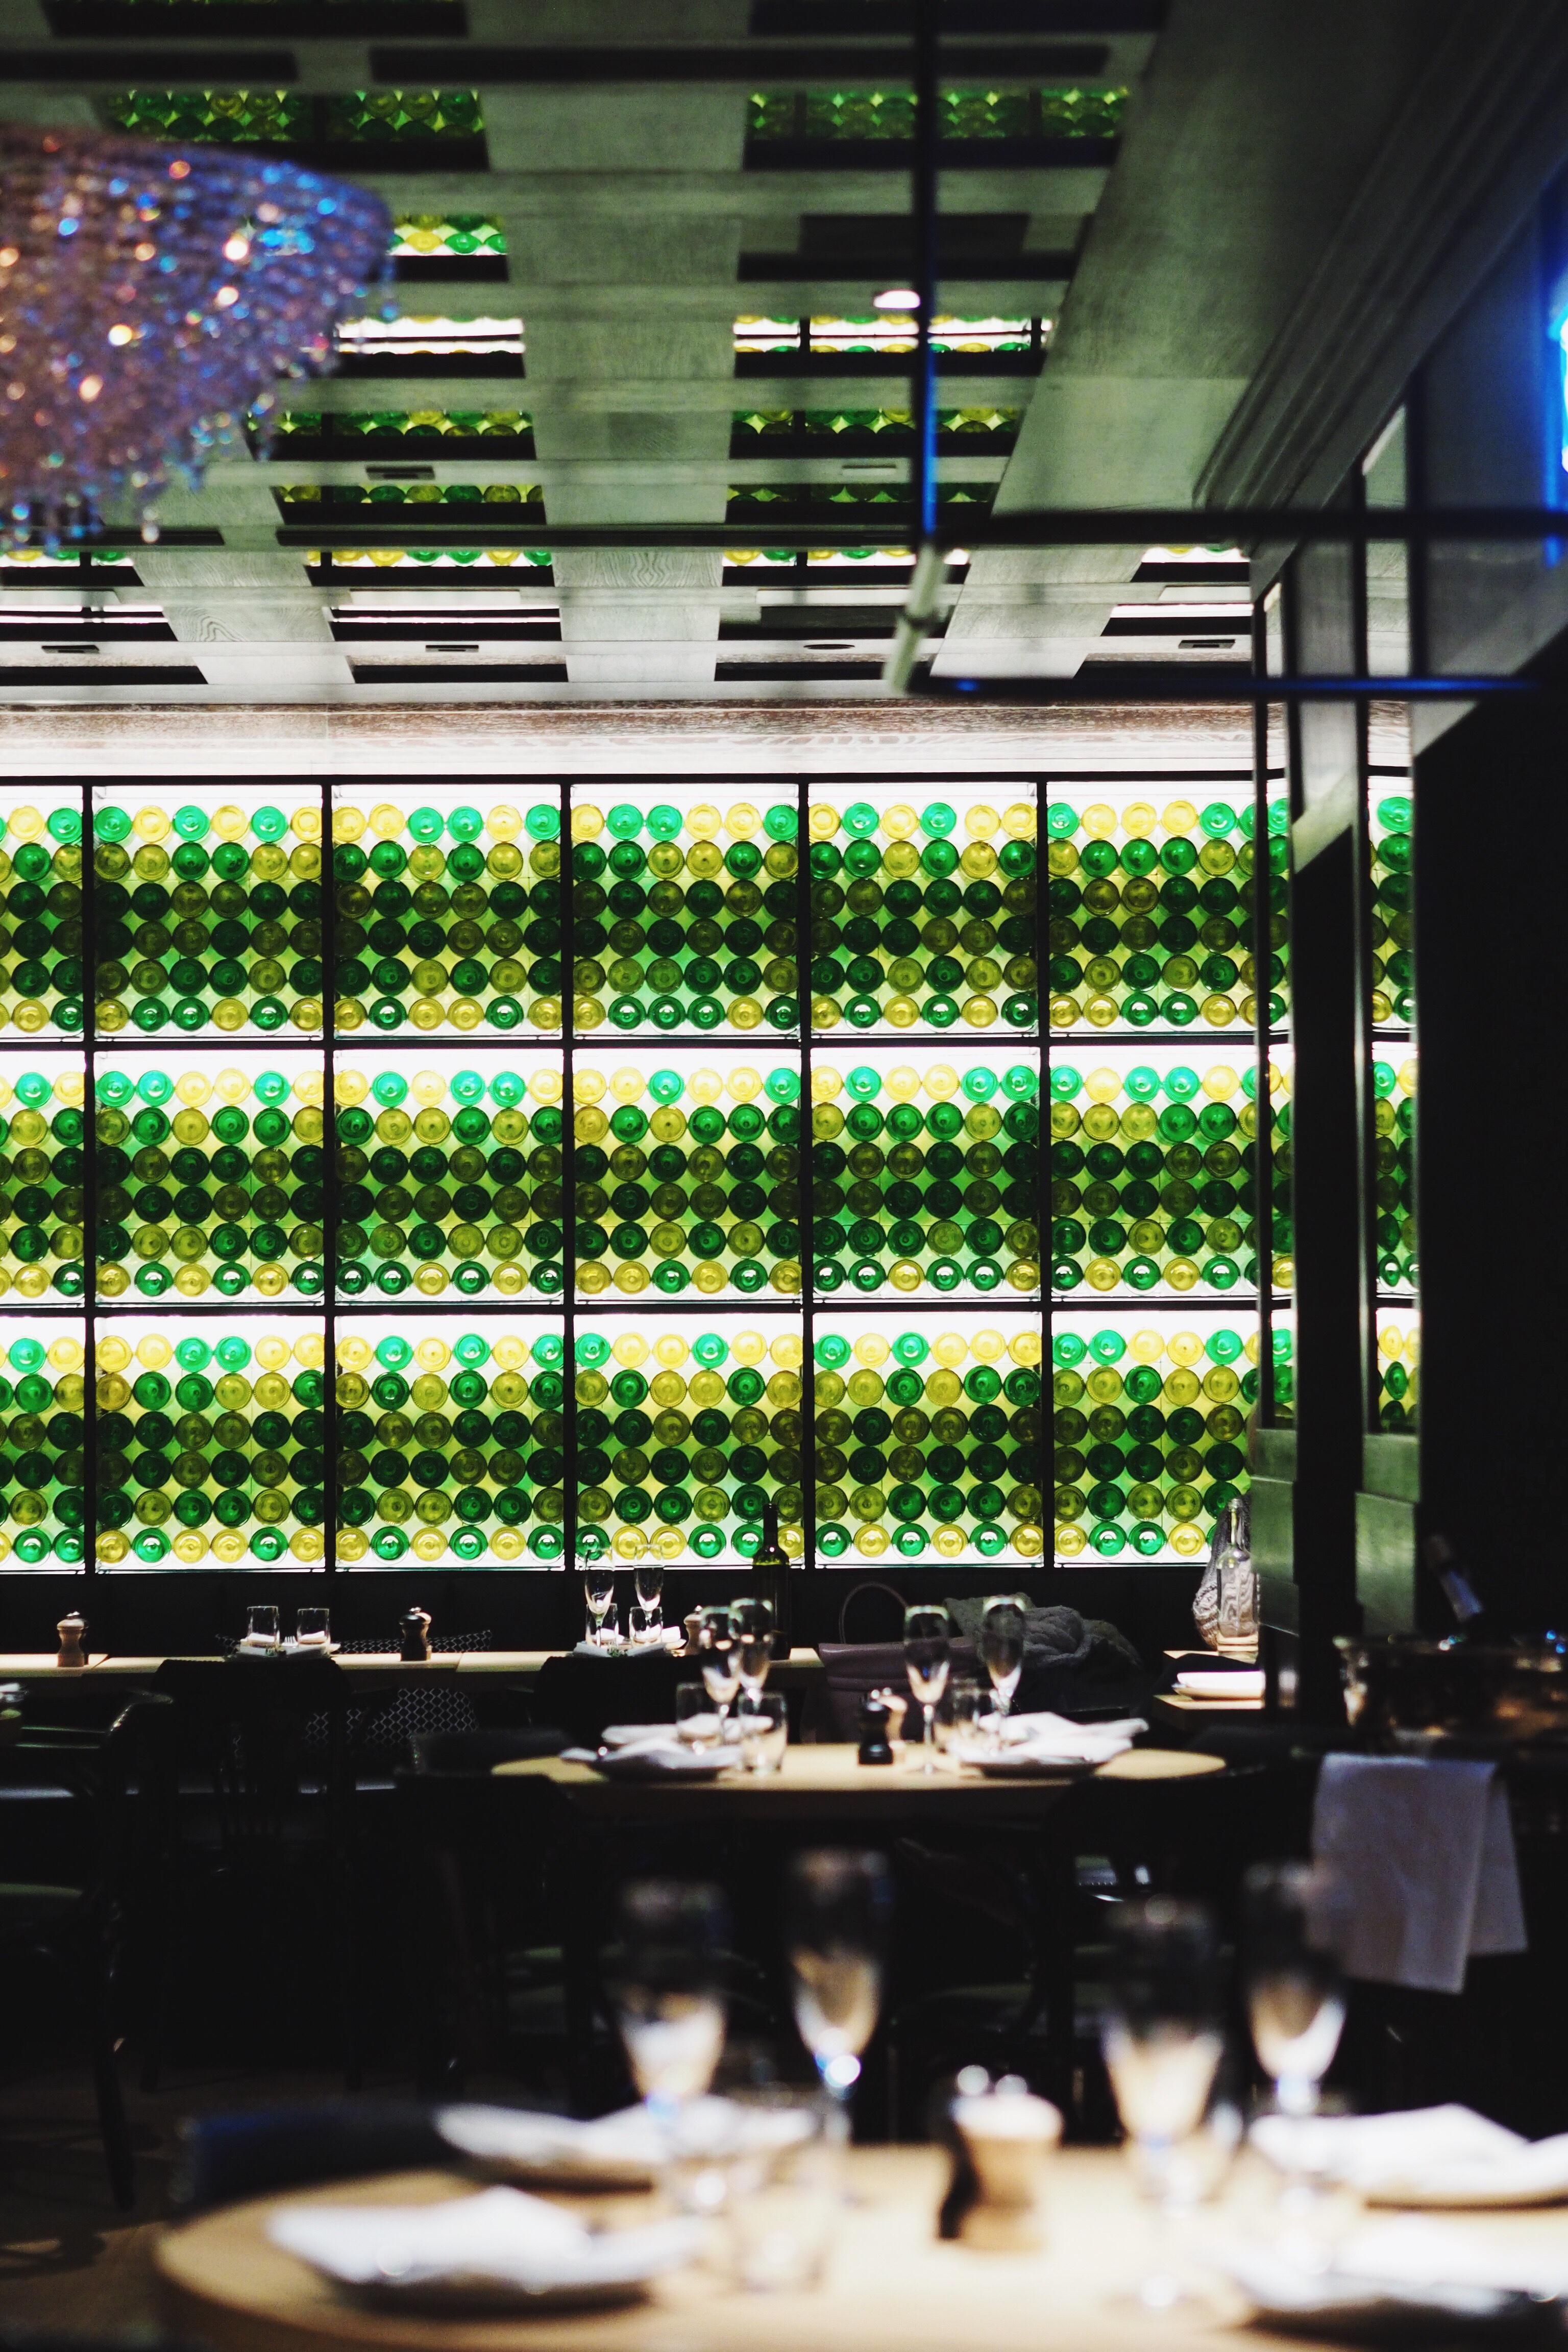 restaurant empfehlung frankfurt vetro vero summer lee. Black Bedroom Furniture Sets. Home Design Ideas